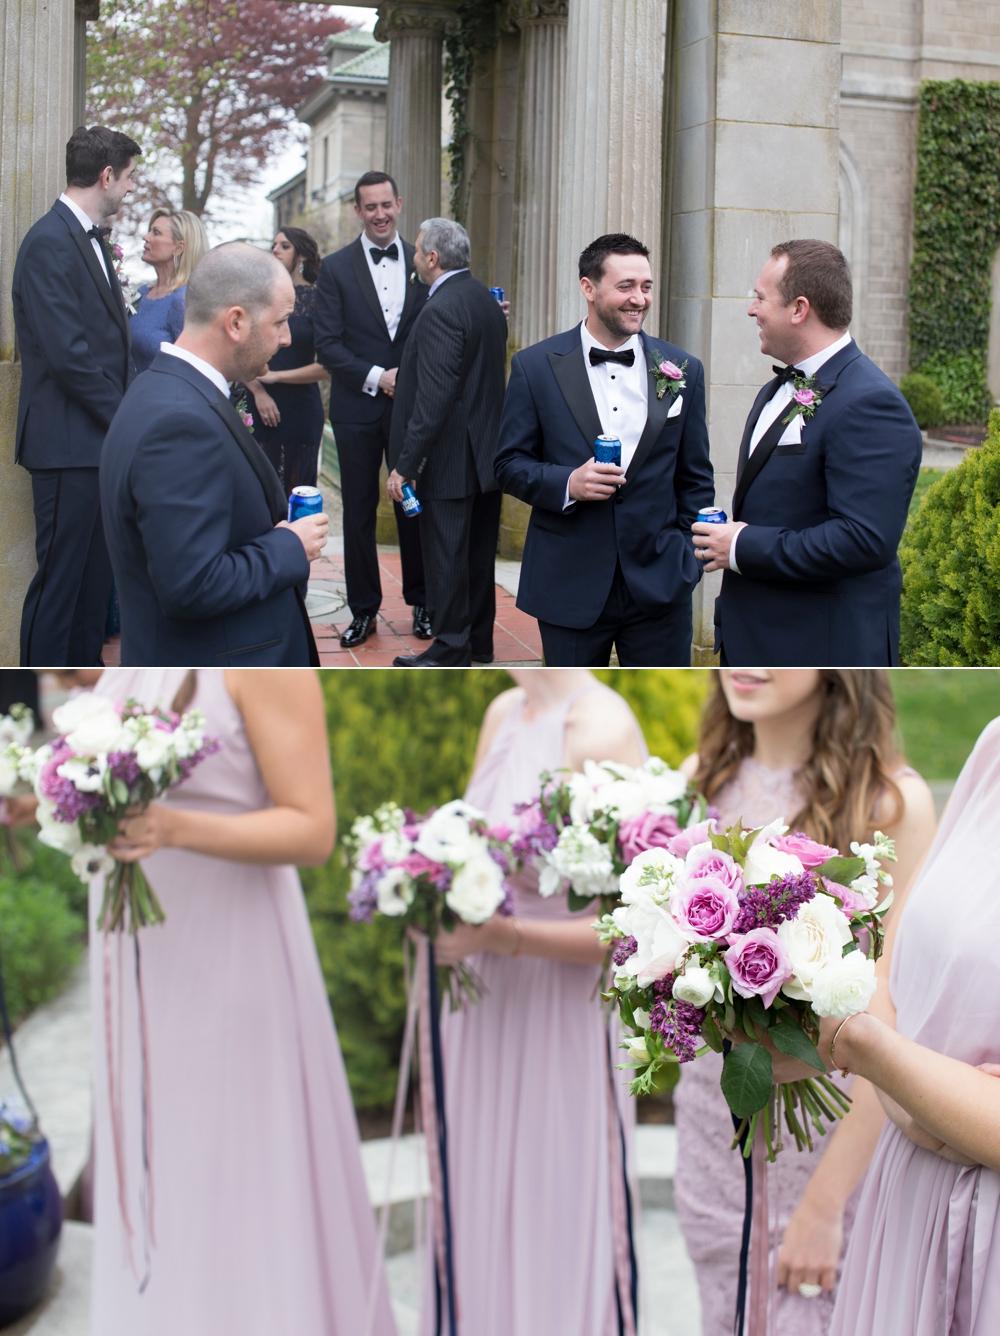 EoilaMansion_Wedding_Leah&Tom_0021.jpg